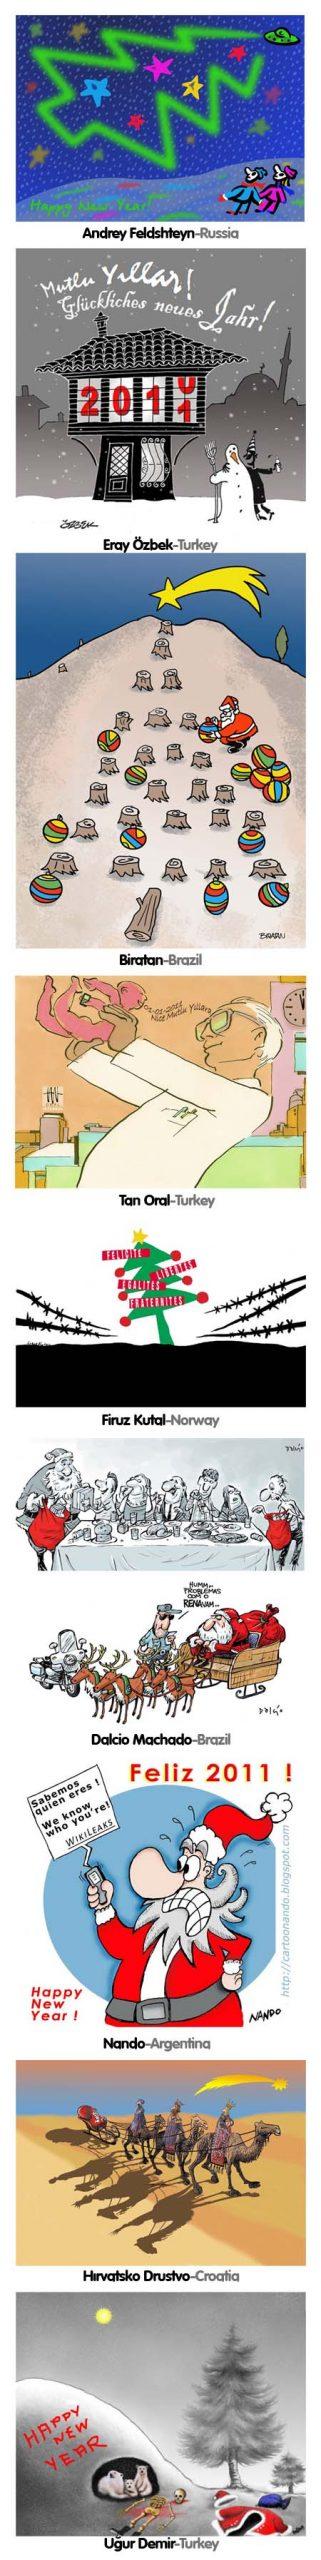 2011-collage1.jpg